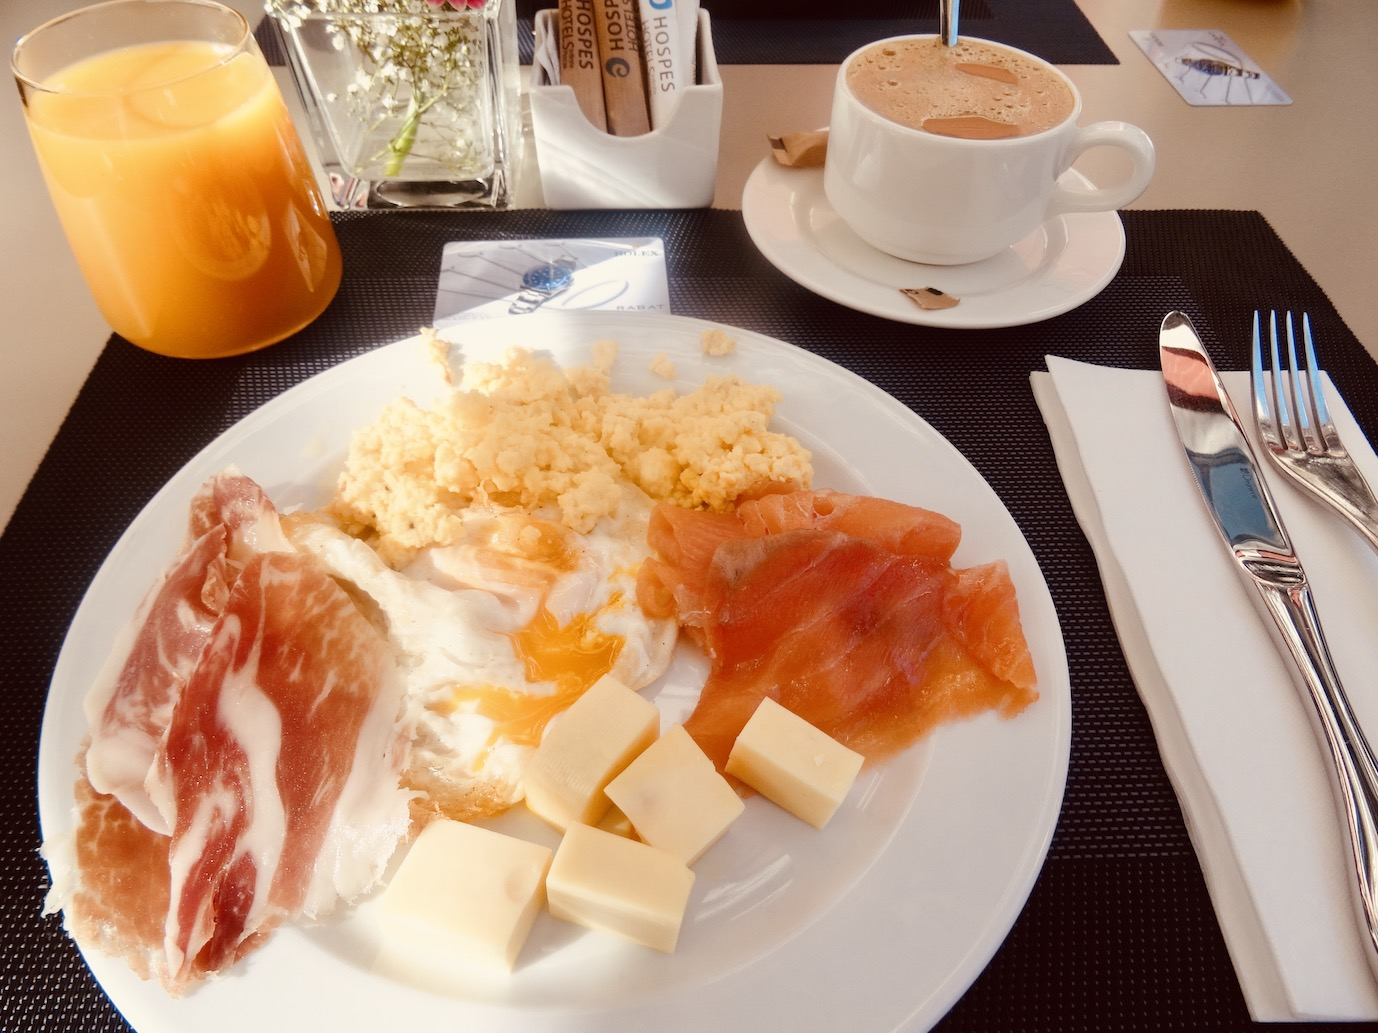 Breakfast at Hotel Hospes Palau de la Mar Zaragoza